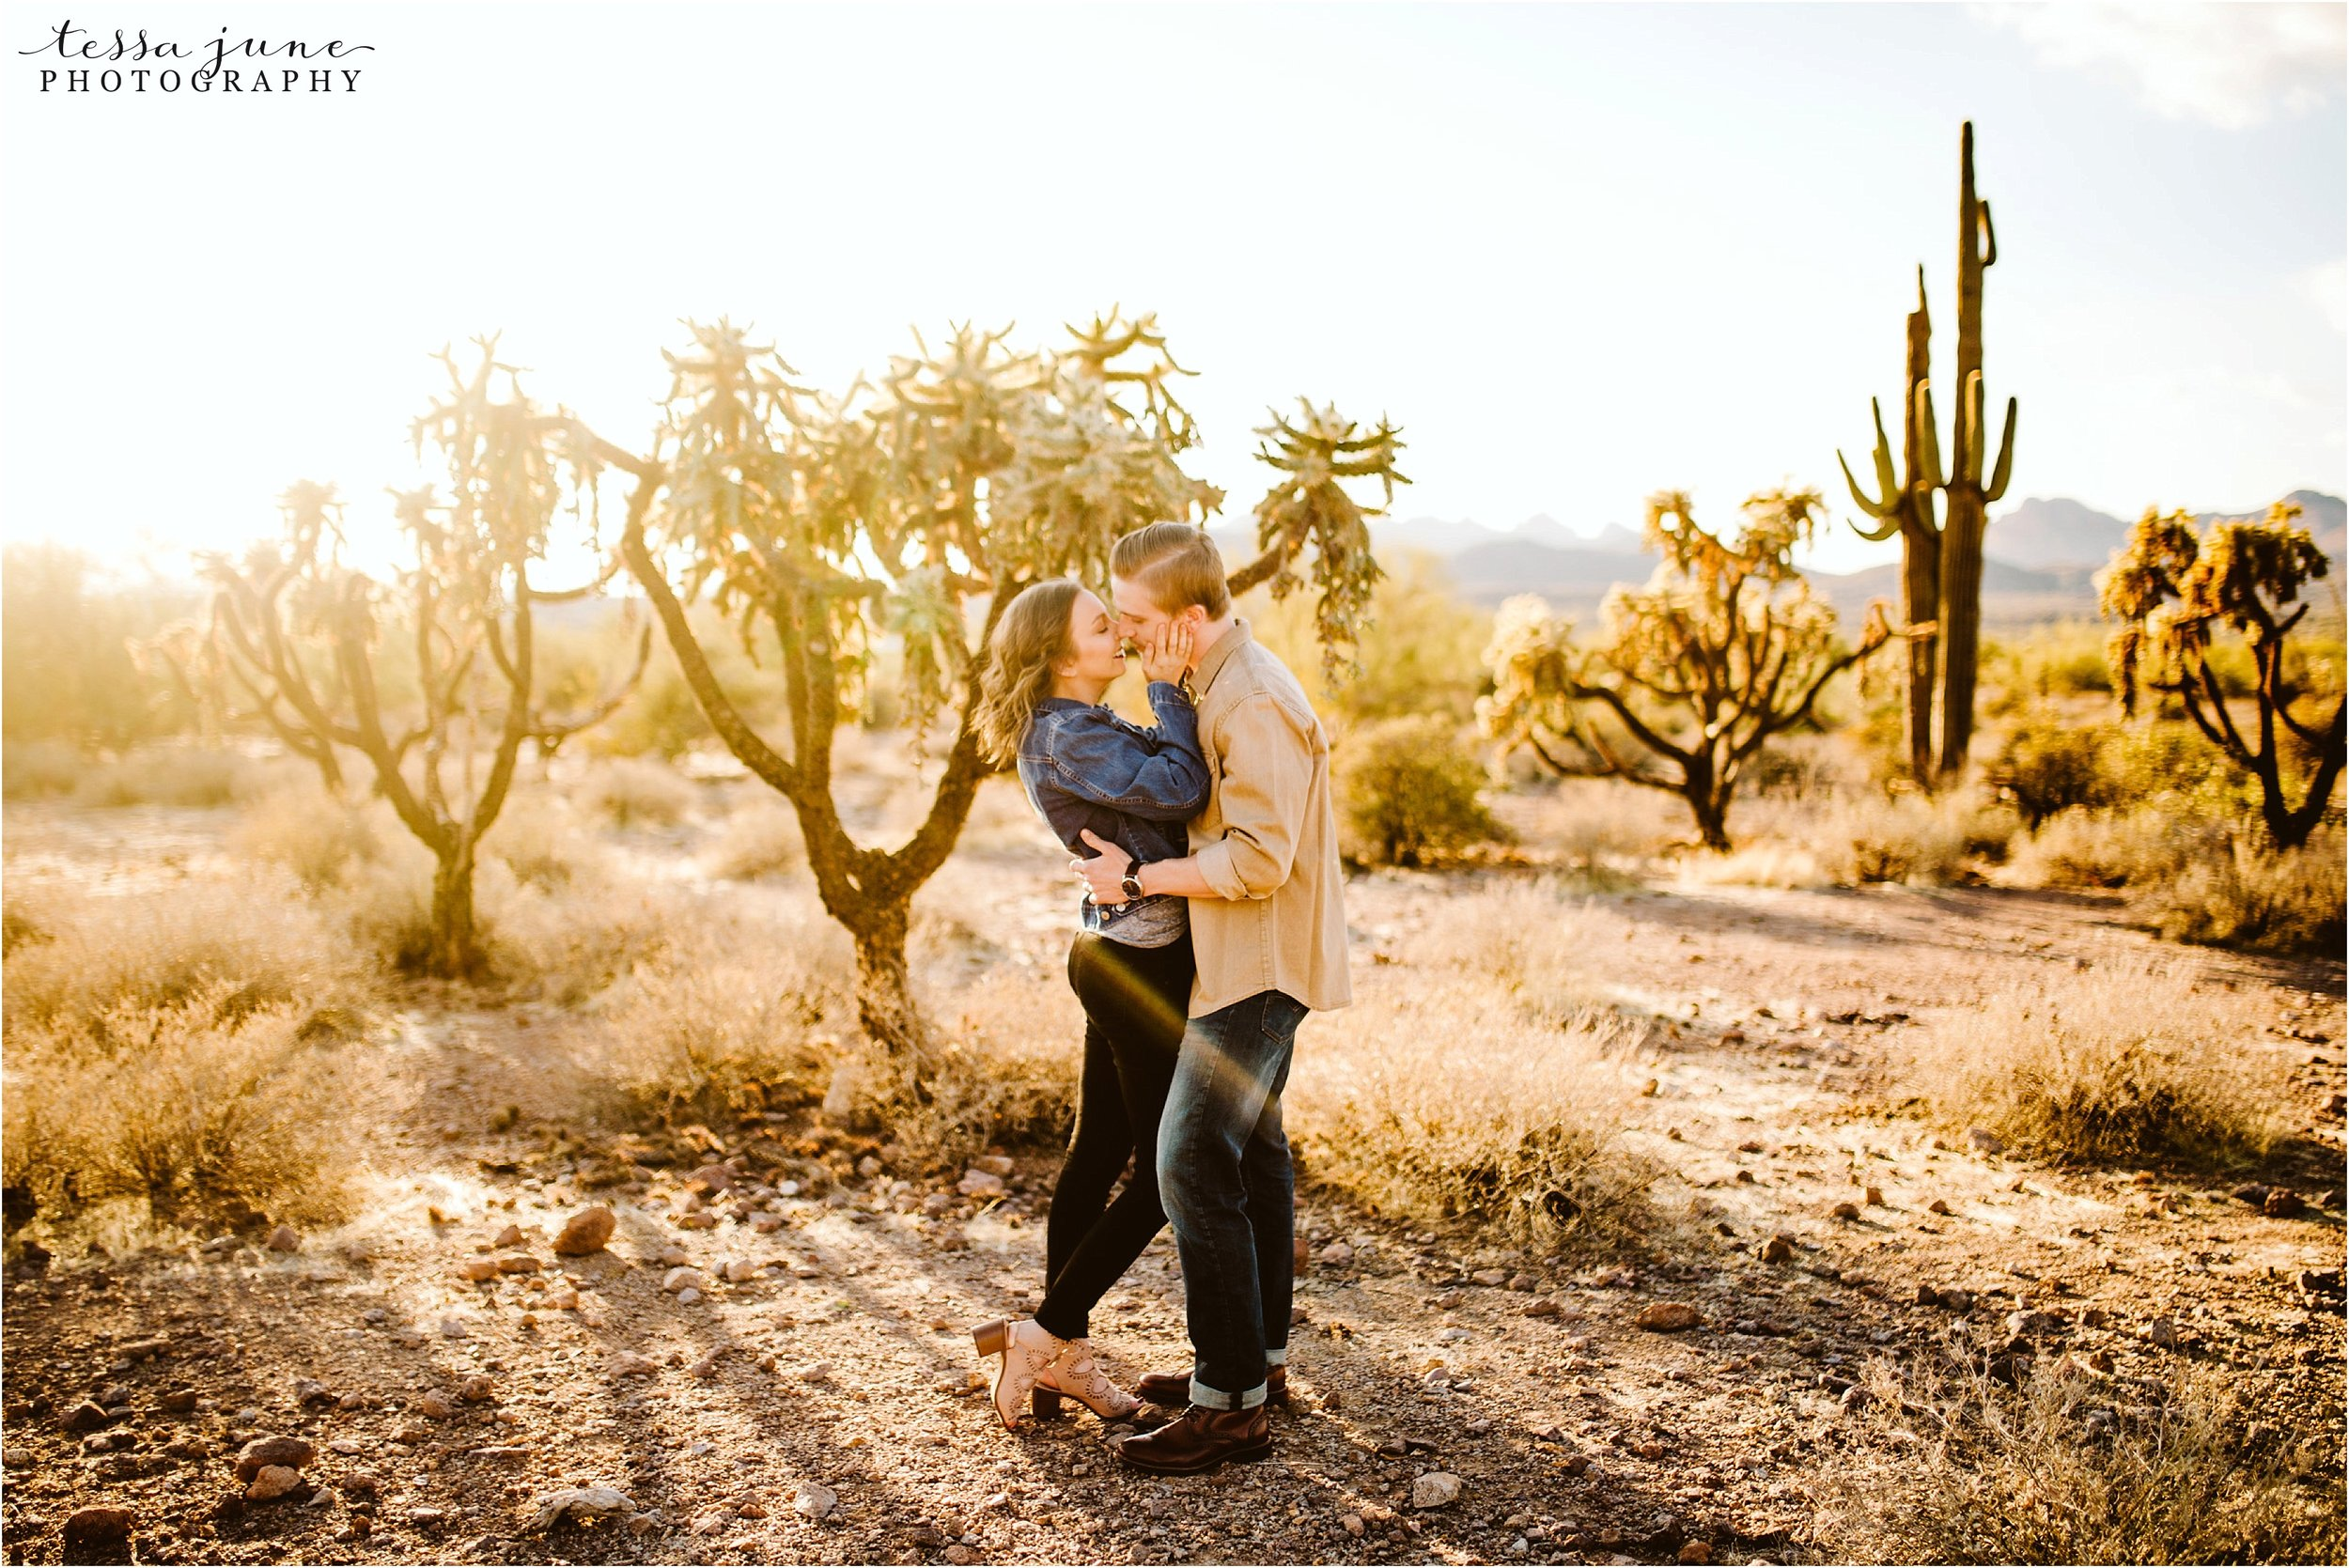 lost-dutchman-state-park-engagement-arizona-destination-photographer-phoenix-4.jpg